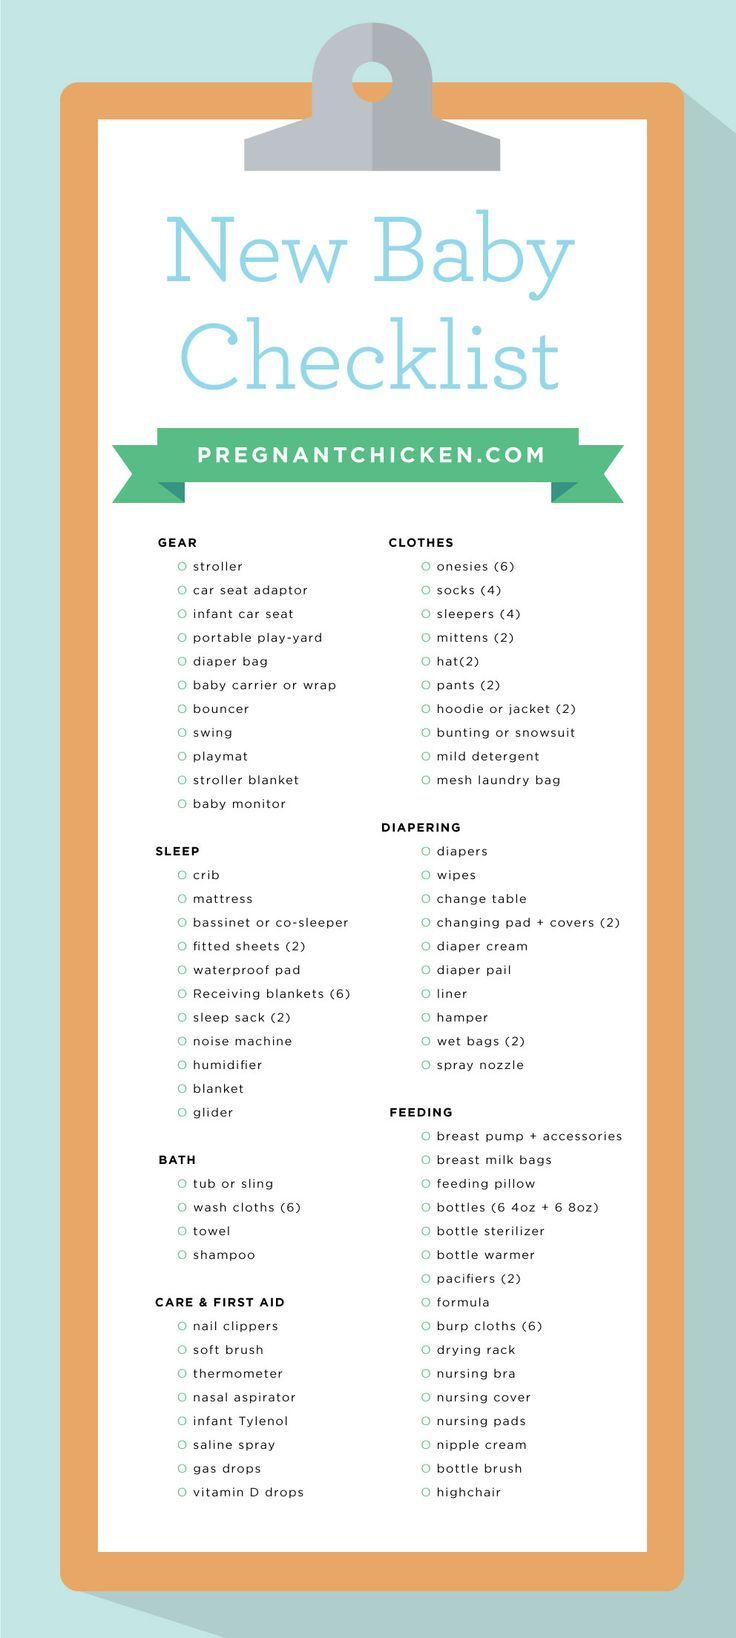 Best Paige Images On   Pregnancy Pregnancy Checklist